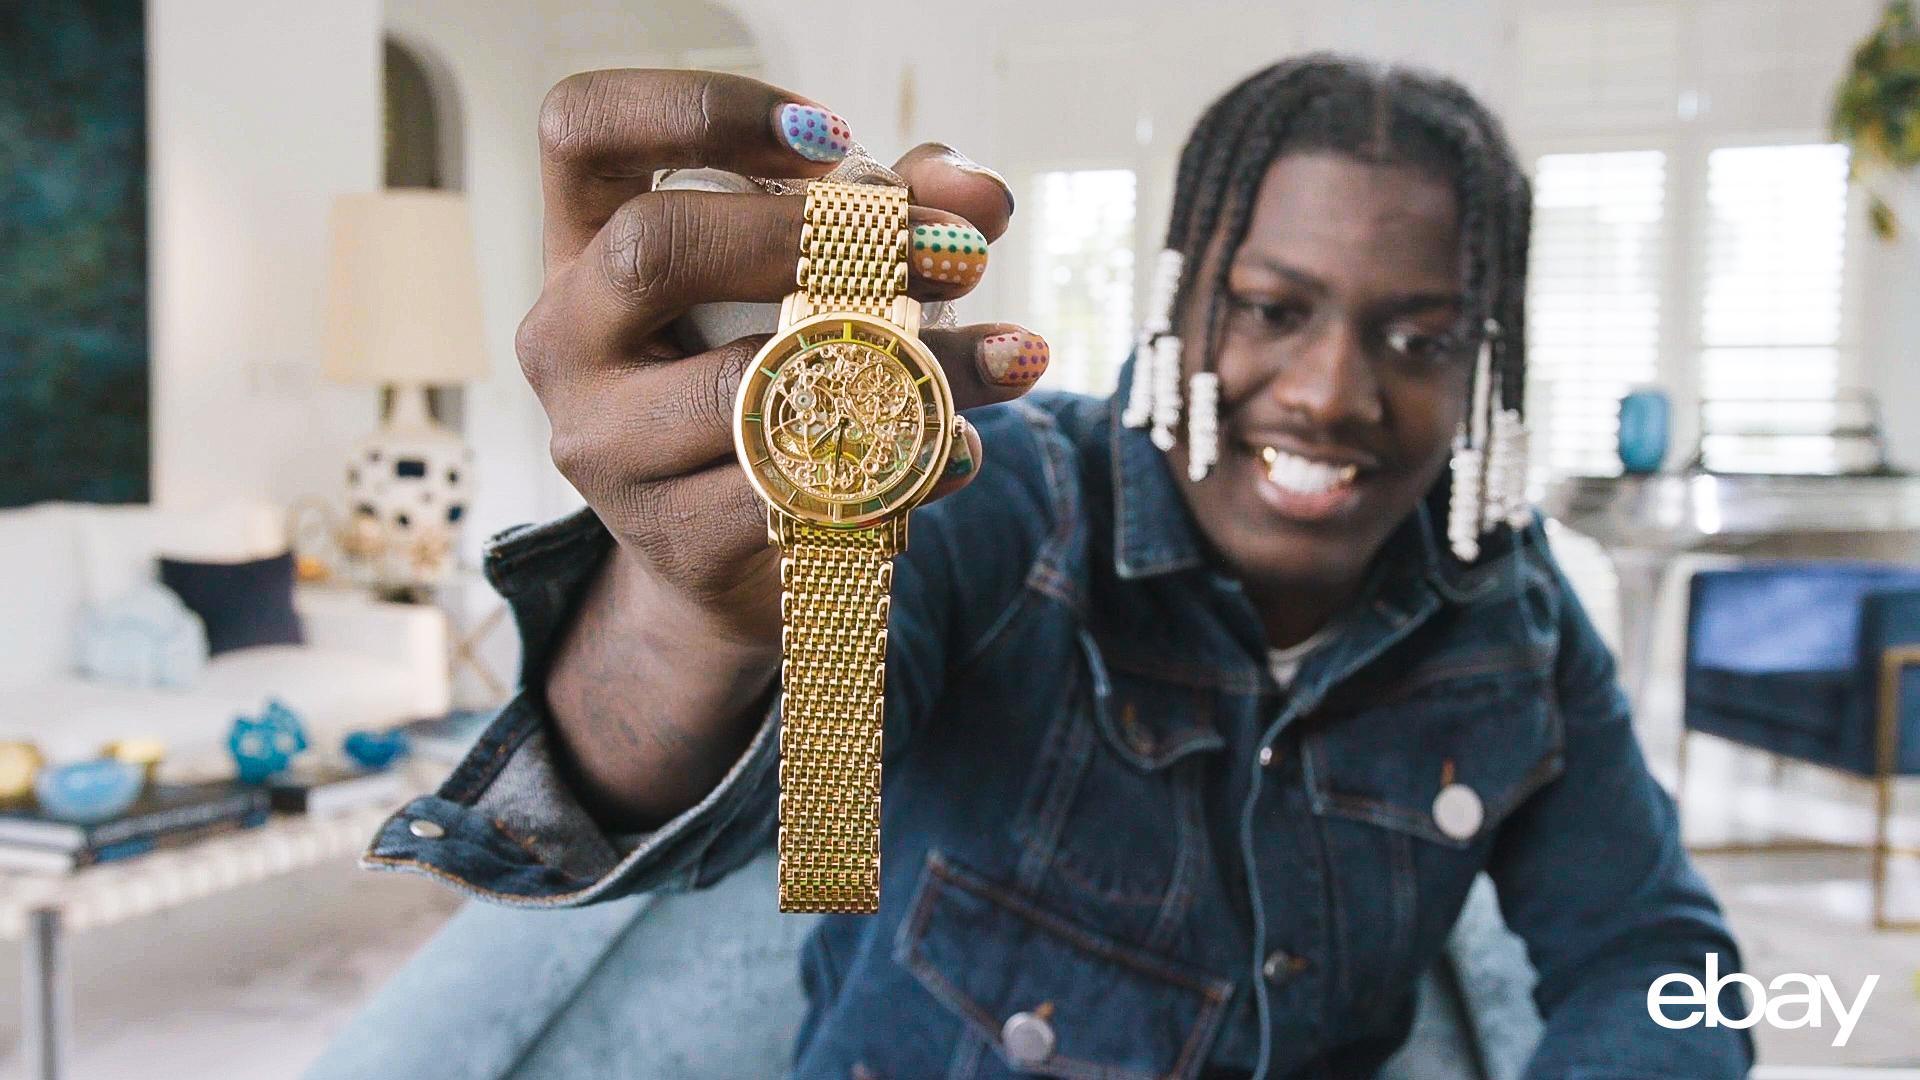 lil yachty gold watch